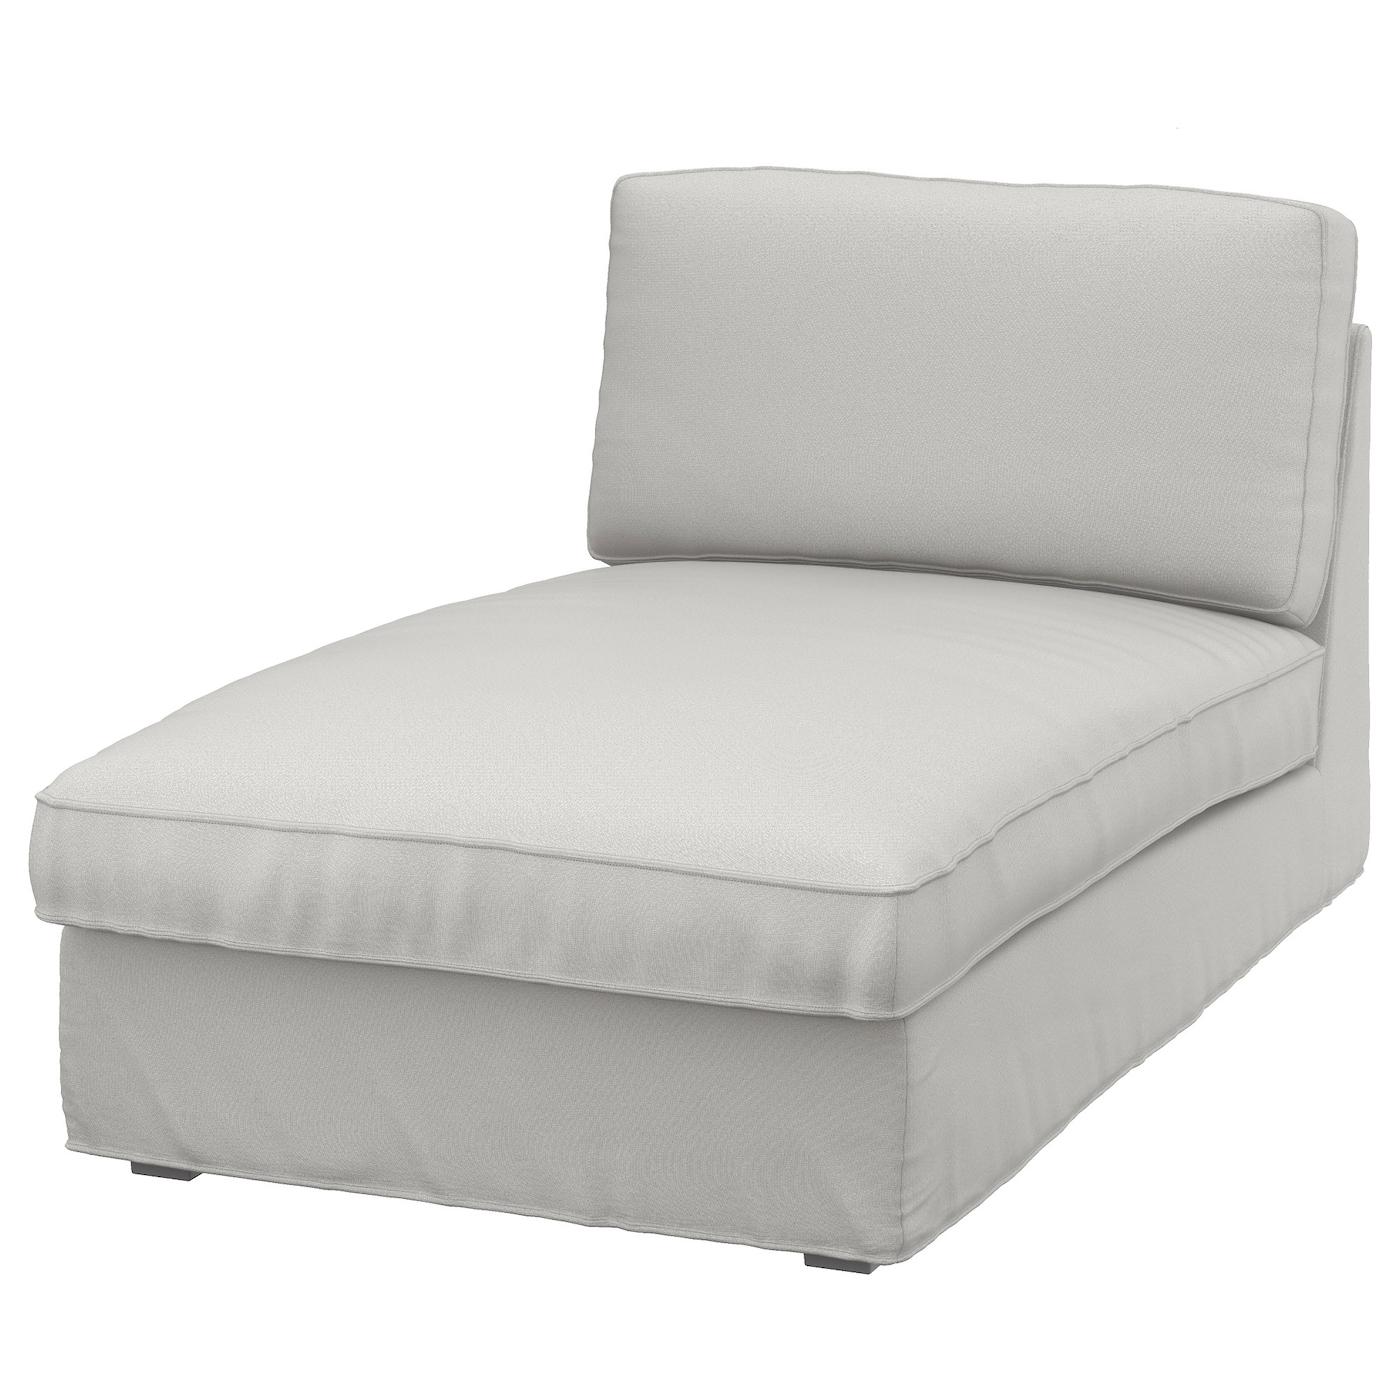 chaise longues ikea ireland dublin